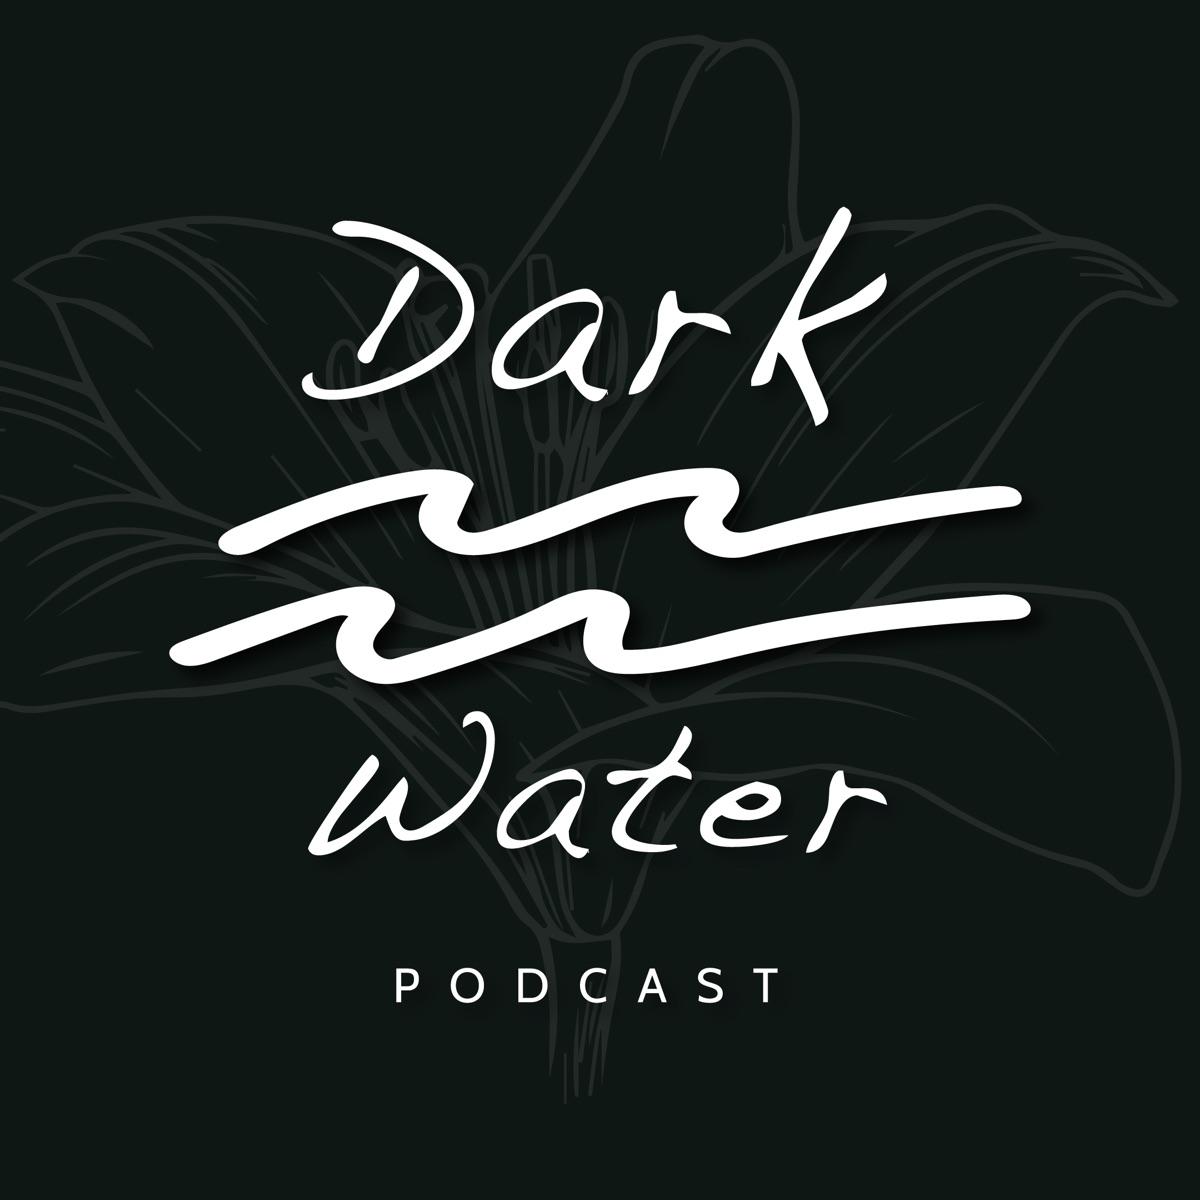 Dark Water Podcast